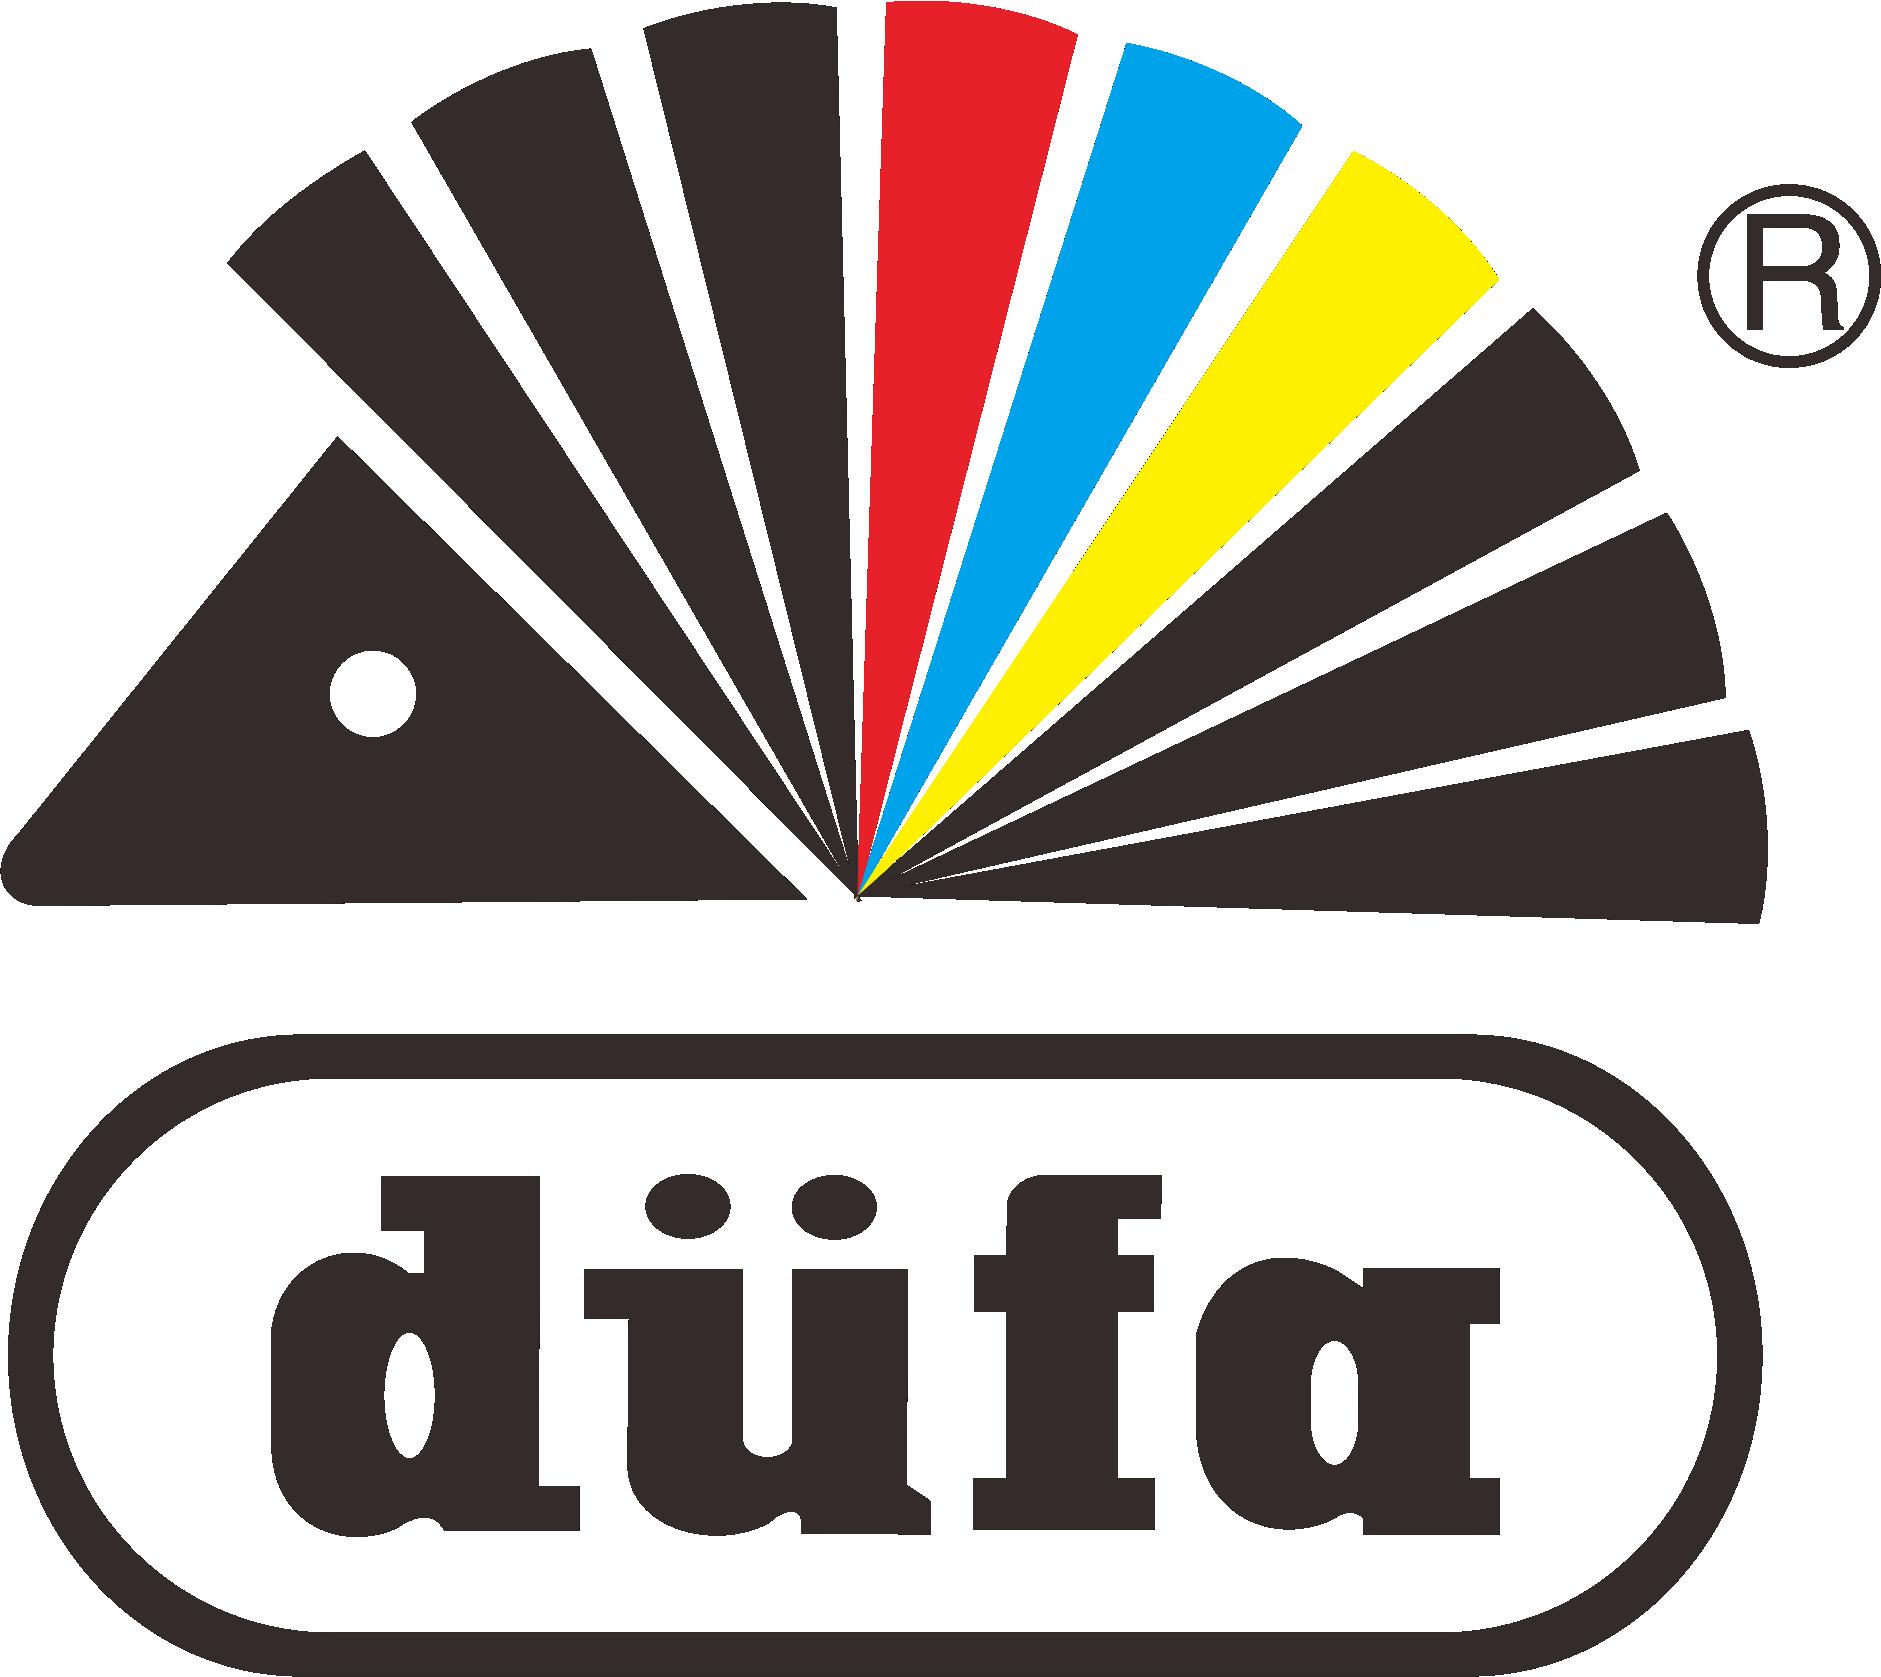 logo logo 标识 标志 设计 矢量 矢量图 素材 图标 1881_1677